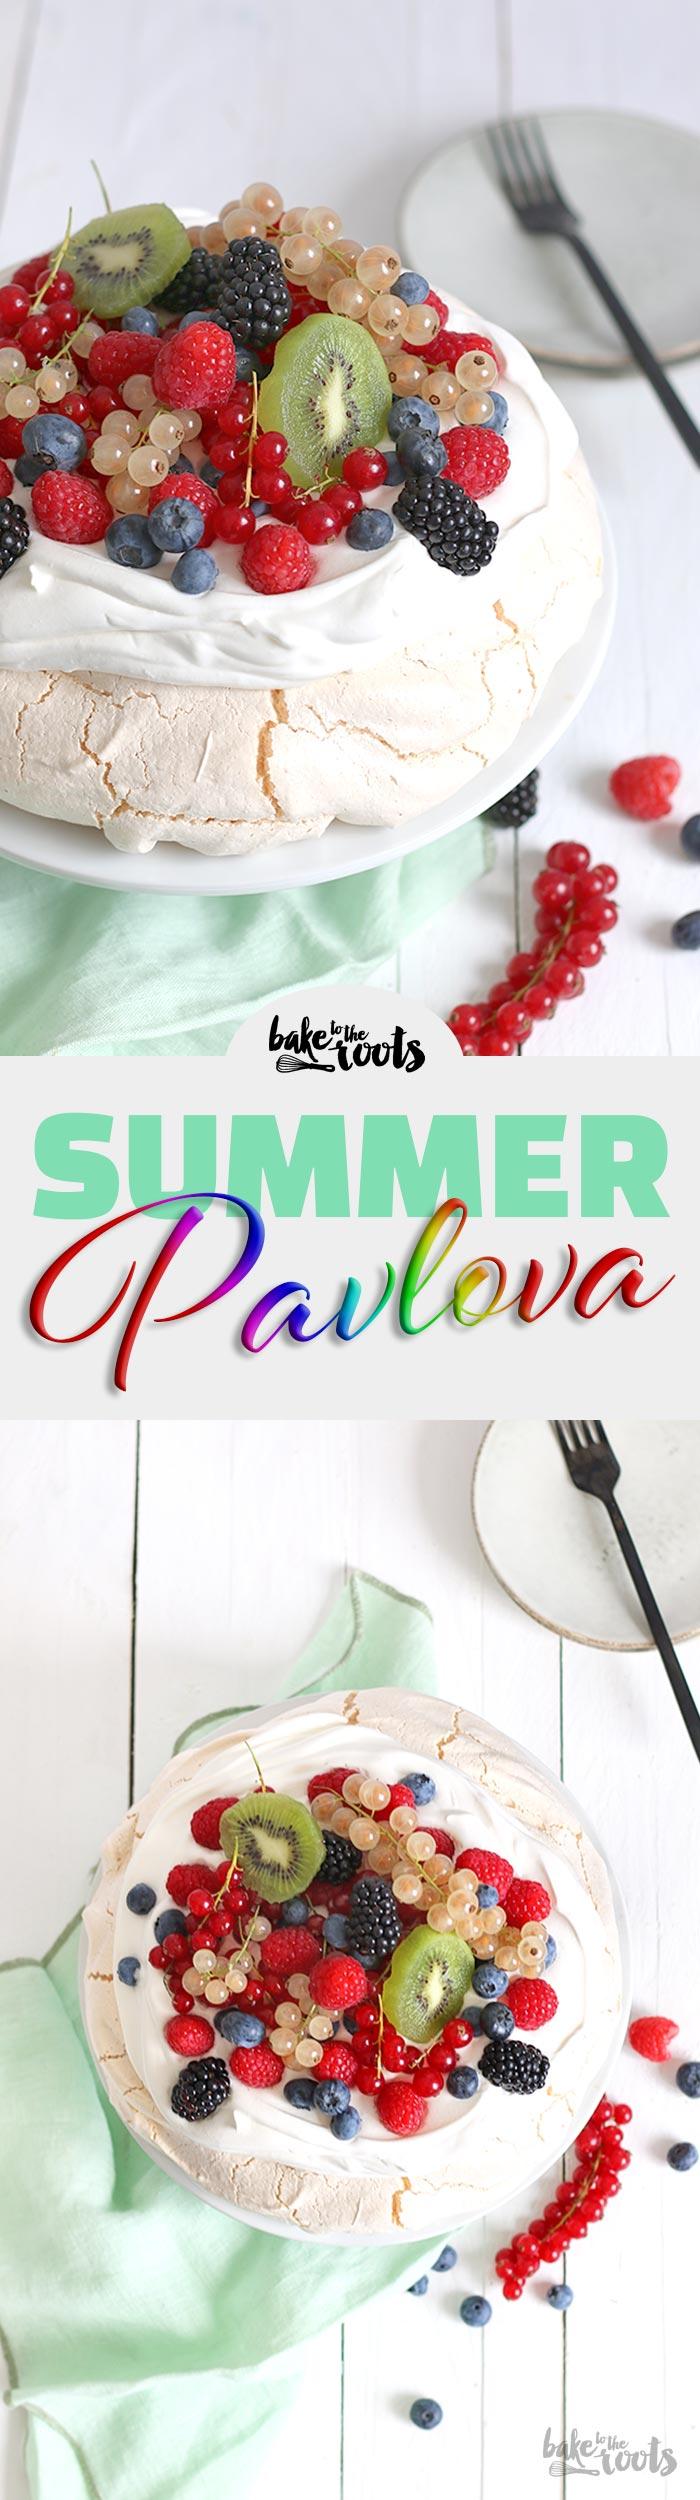 Summer Pavlova   Bake to the roots